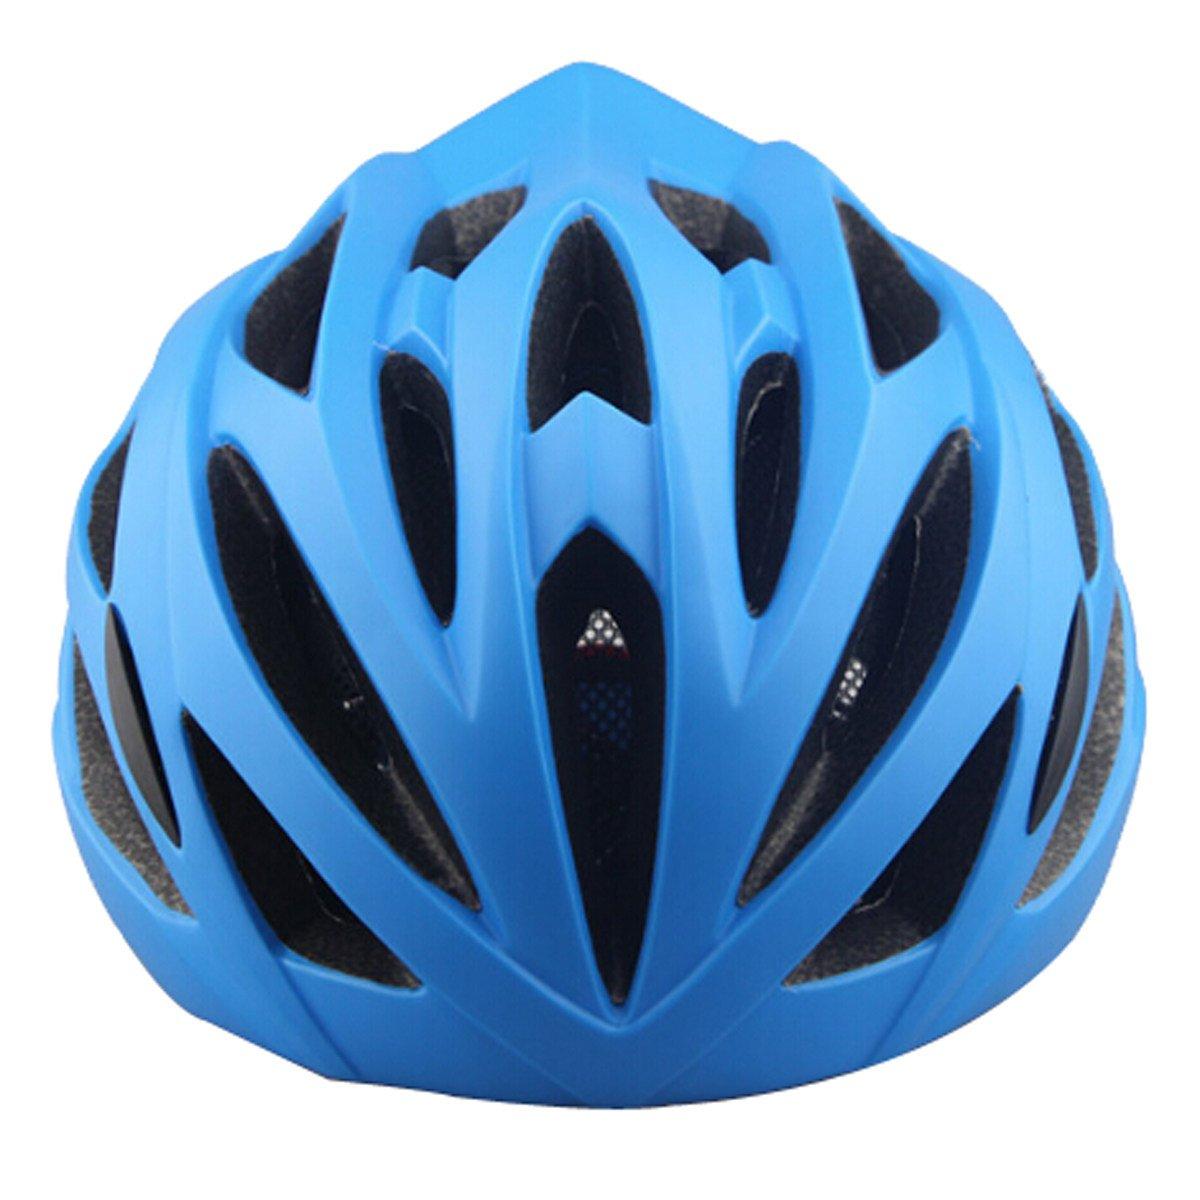 Fahrradhelm   Reithelm   Sporthelm,Blau